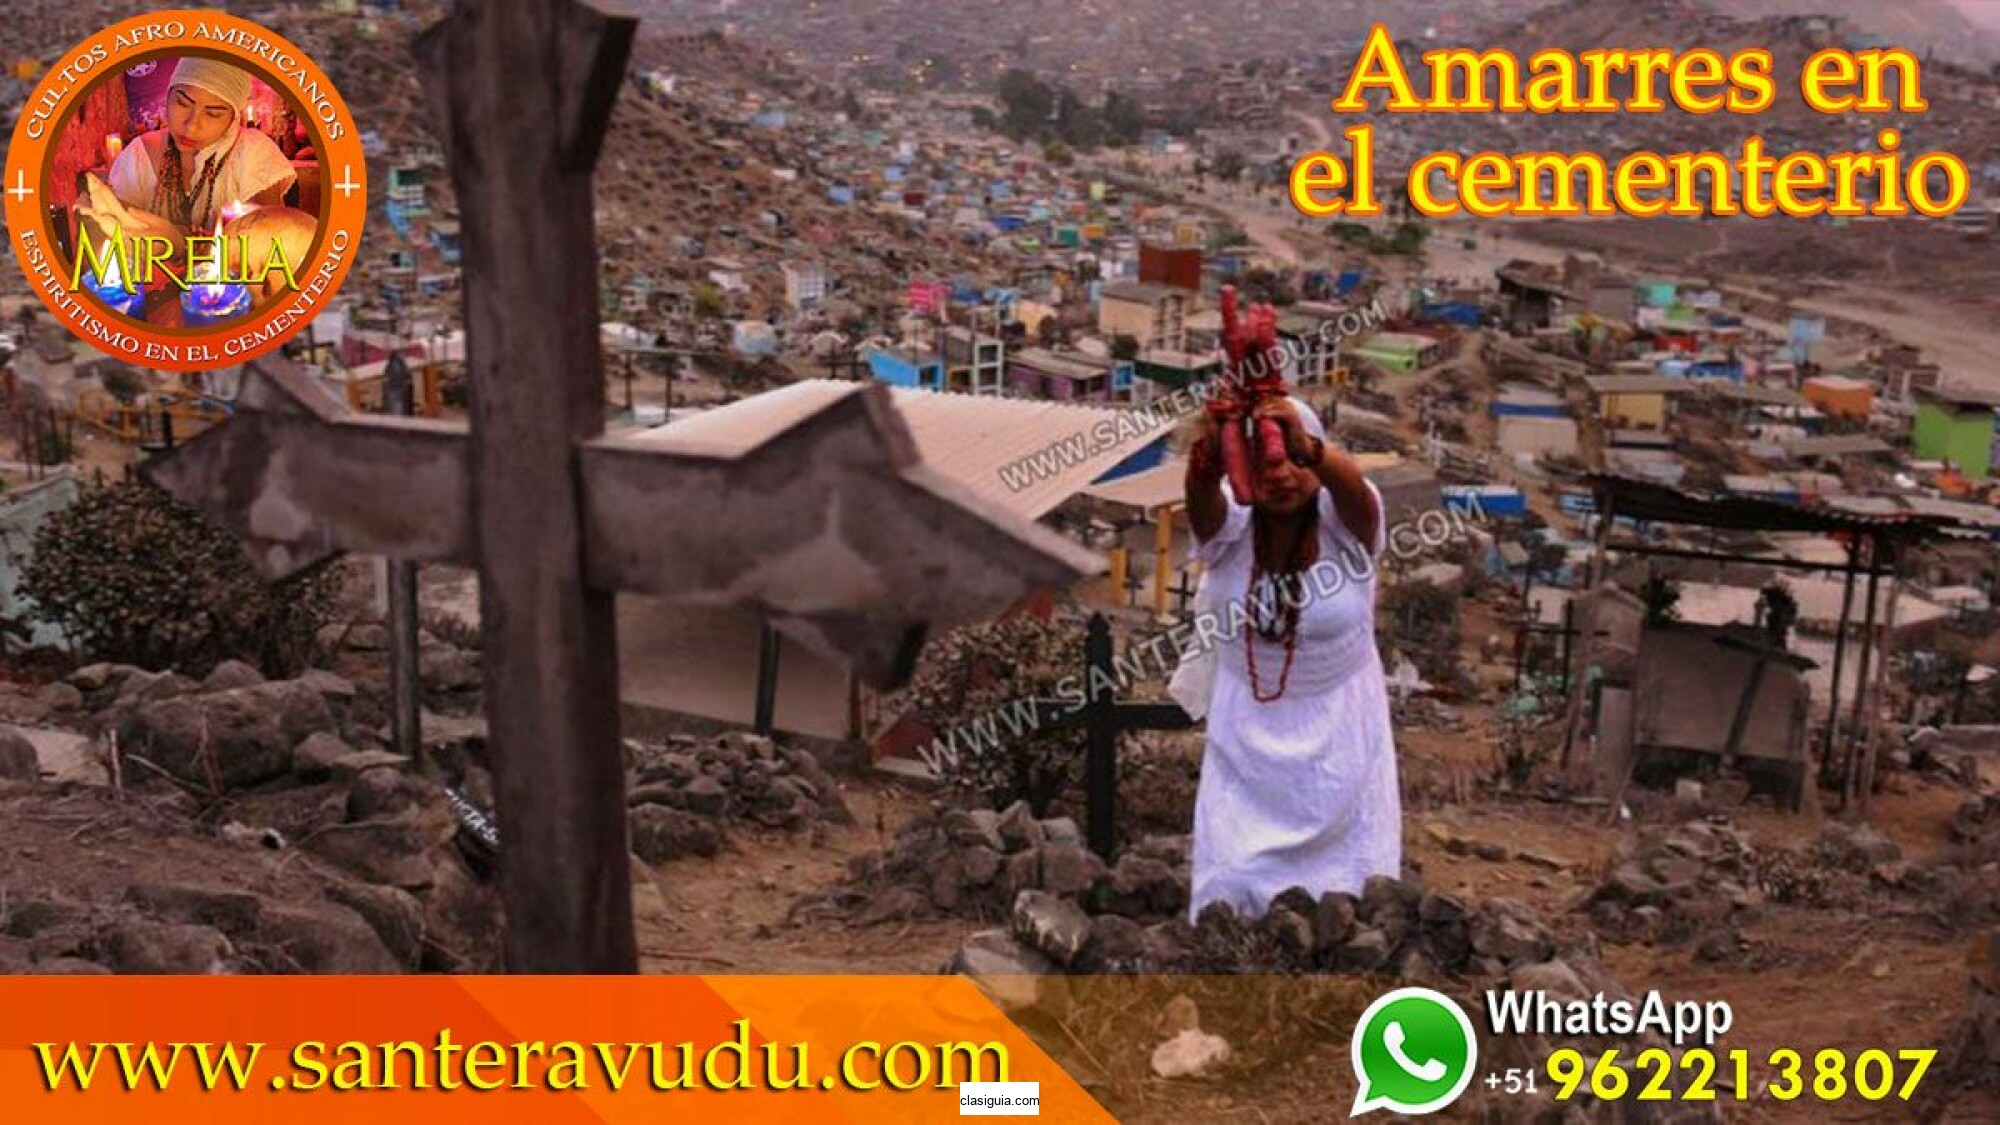 AMARRES DE AMOR SANTERA VUDU MIRELLA EN ECUADOR